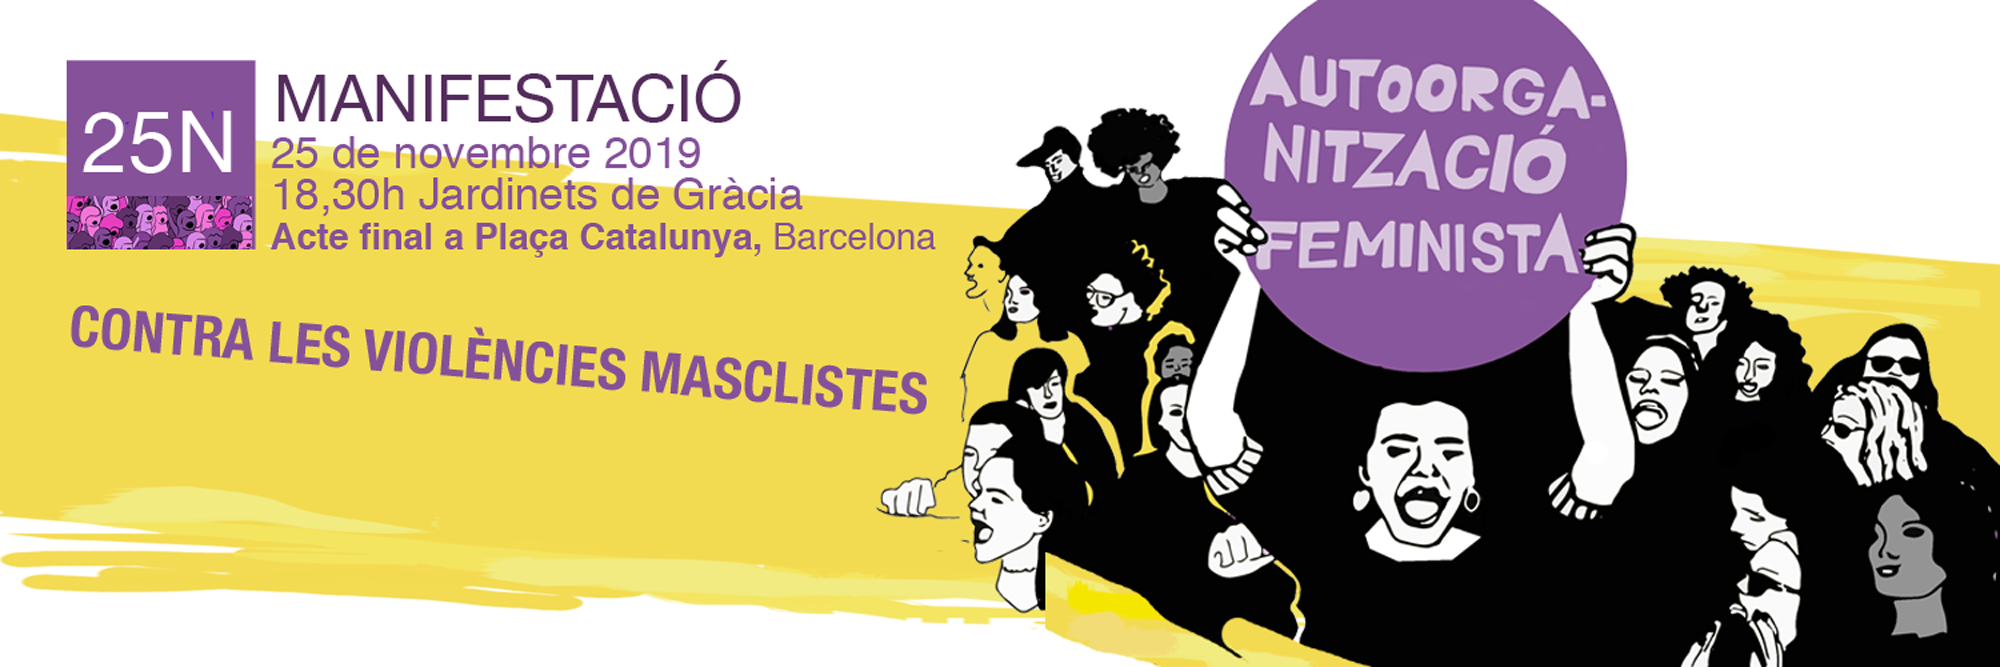 25N-Manifestació